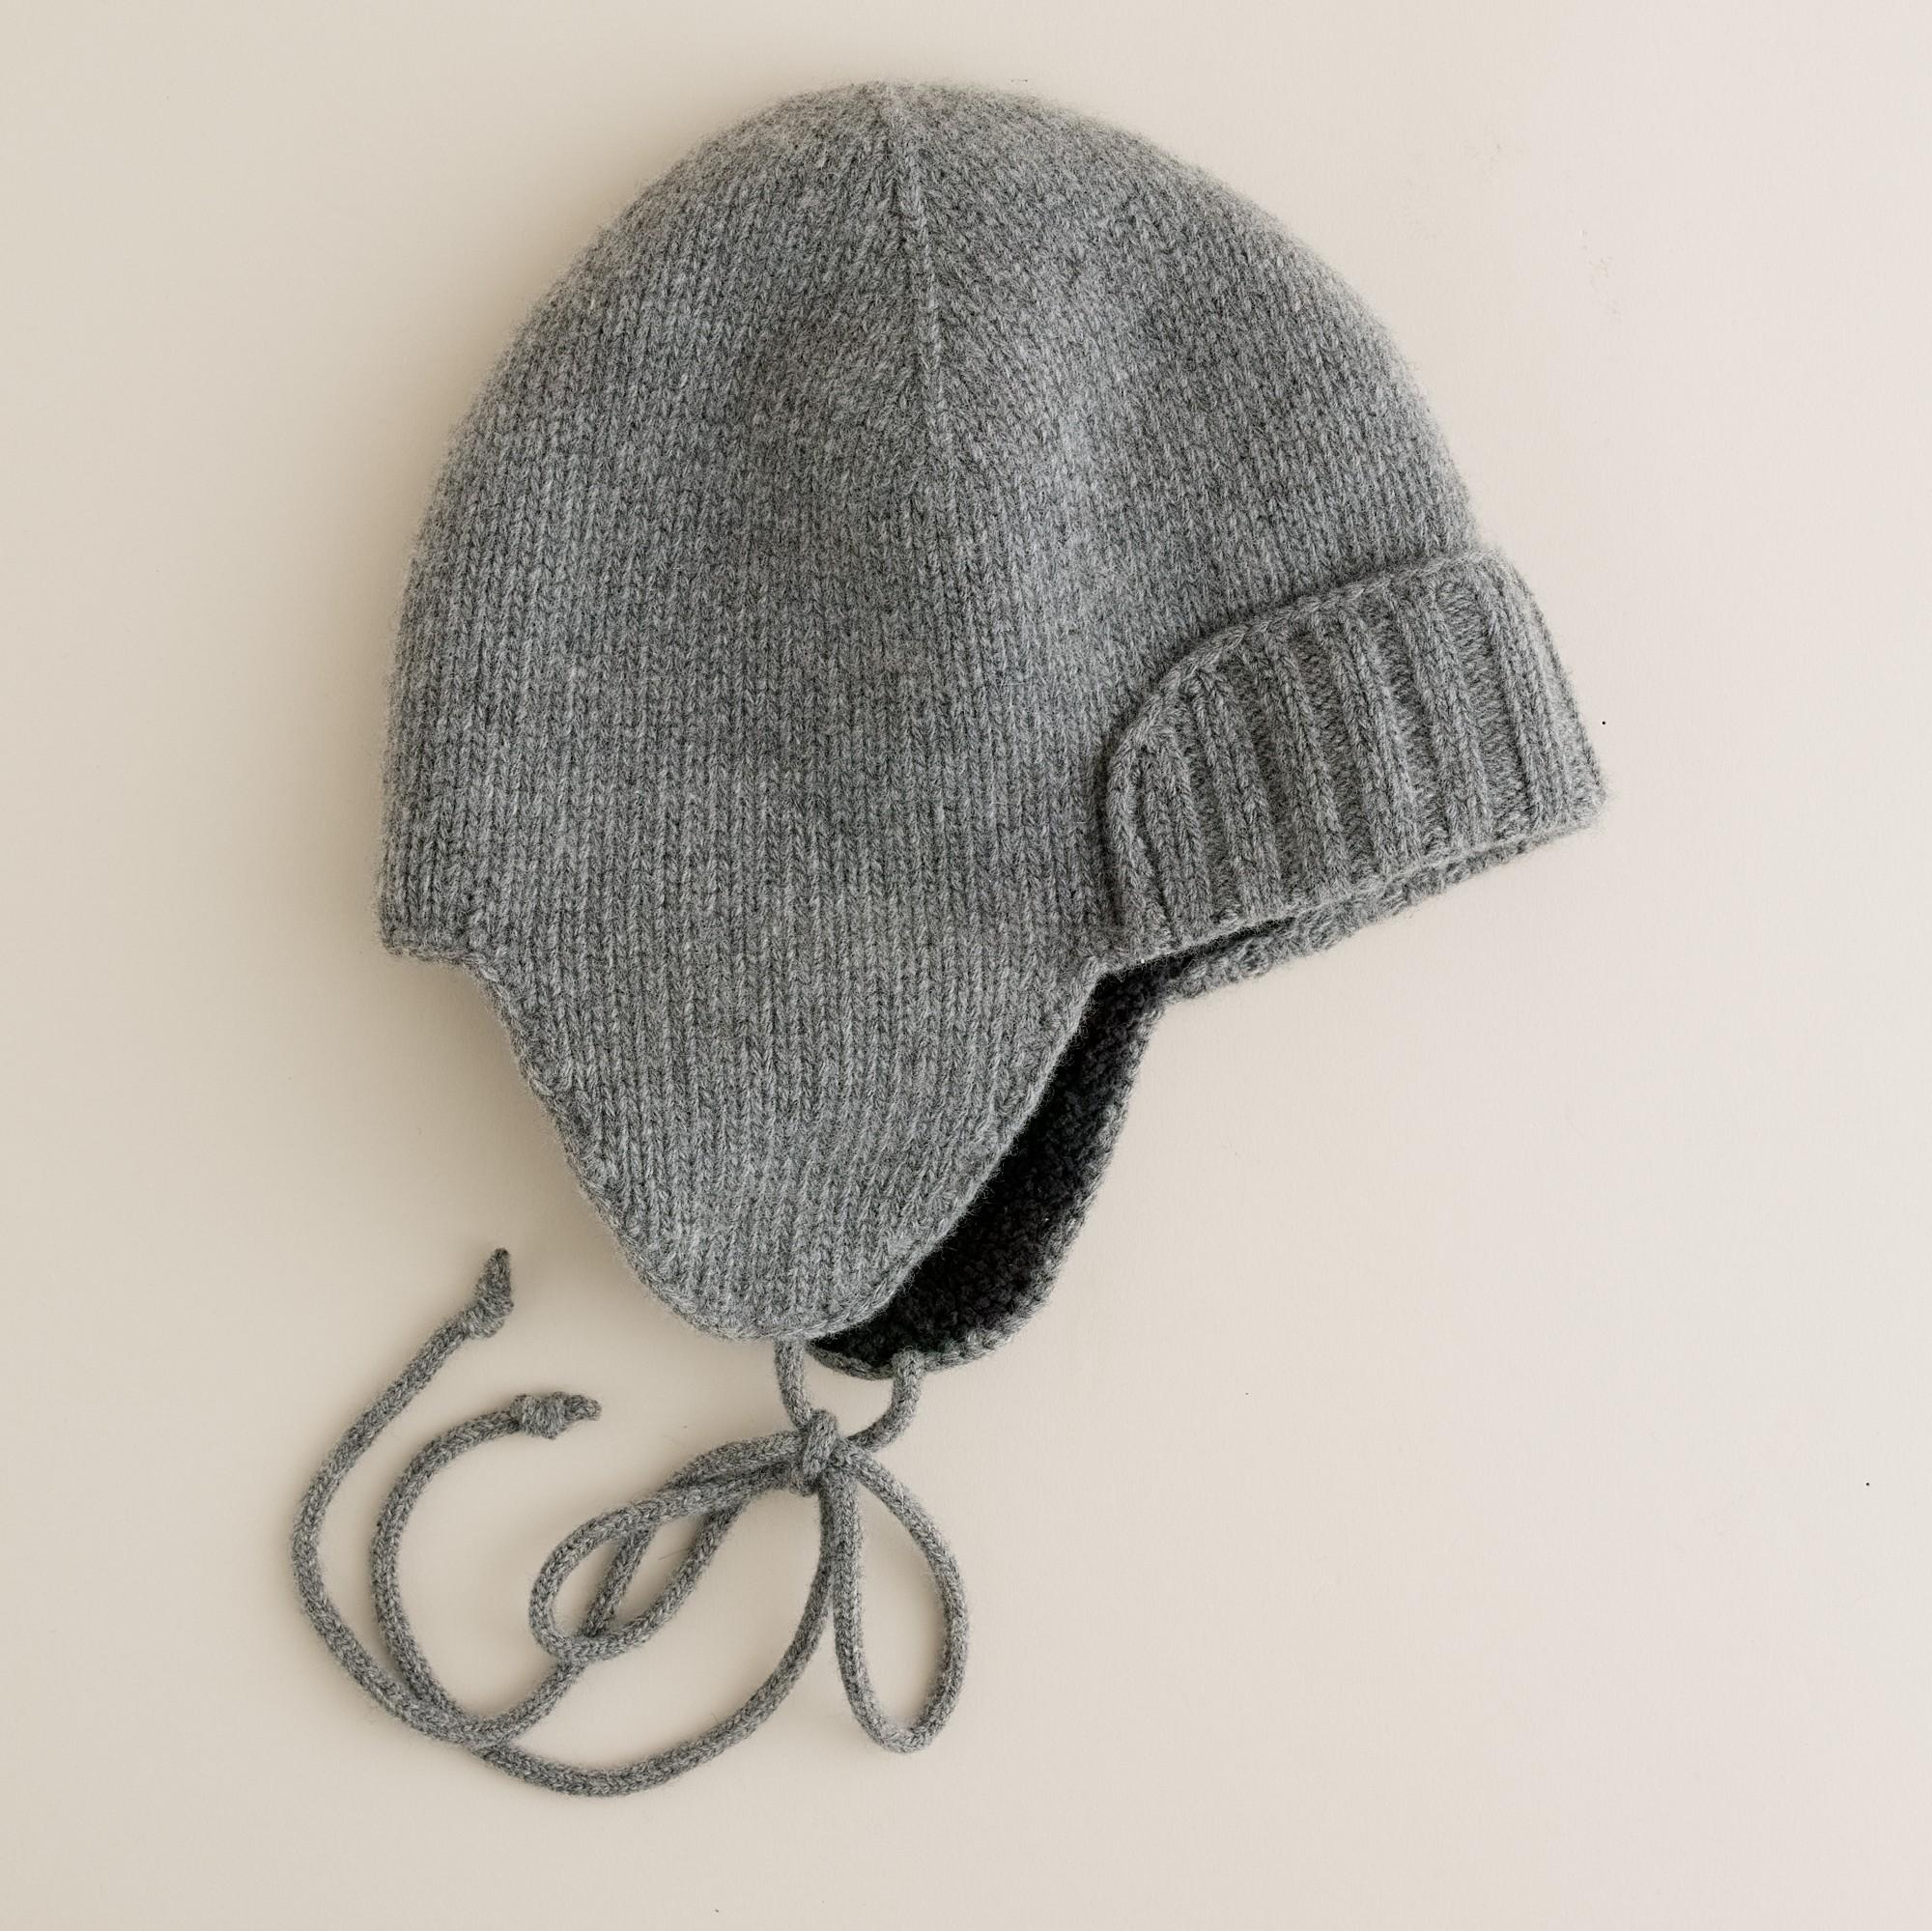 546b6631f J.Crew Hearthstone Trapper Hat in Gray - Lyst